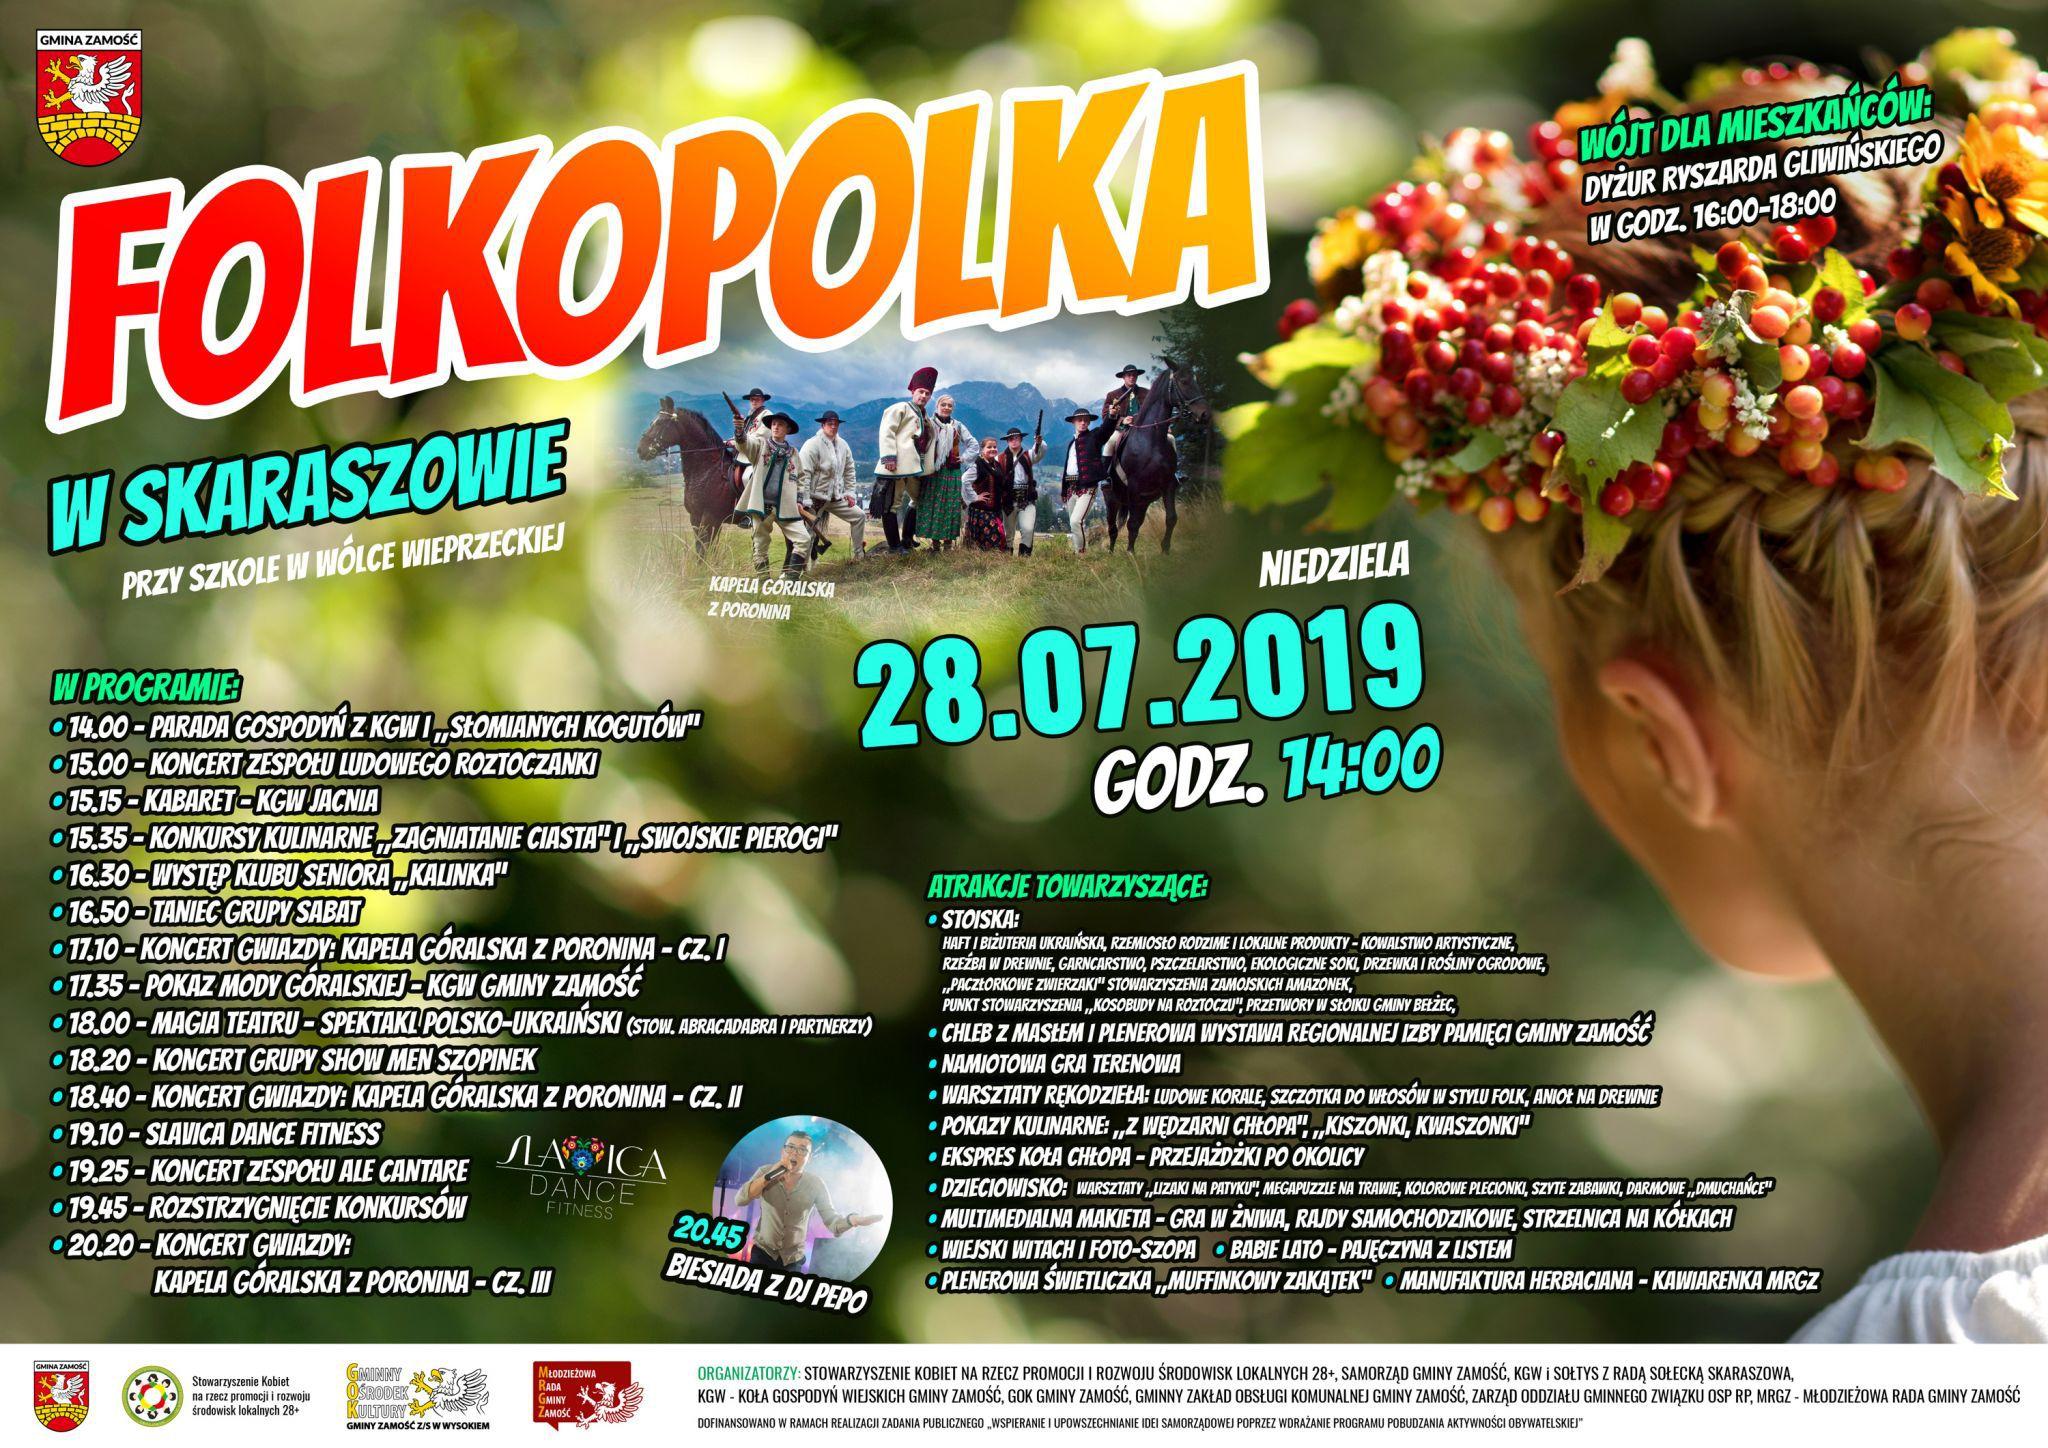 folkopolka 2019 Folkopolka - duża impreza folkowa. Publikujemy program